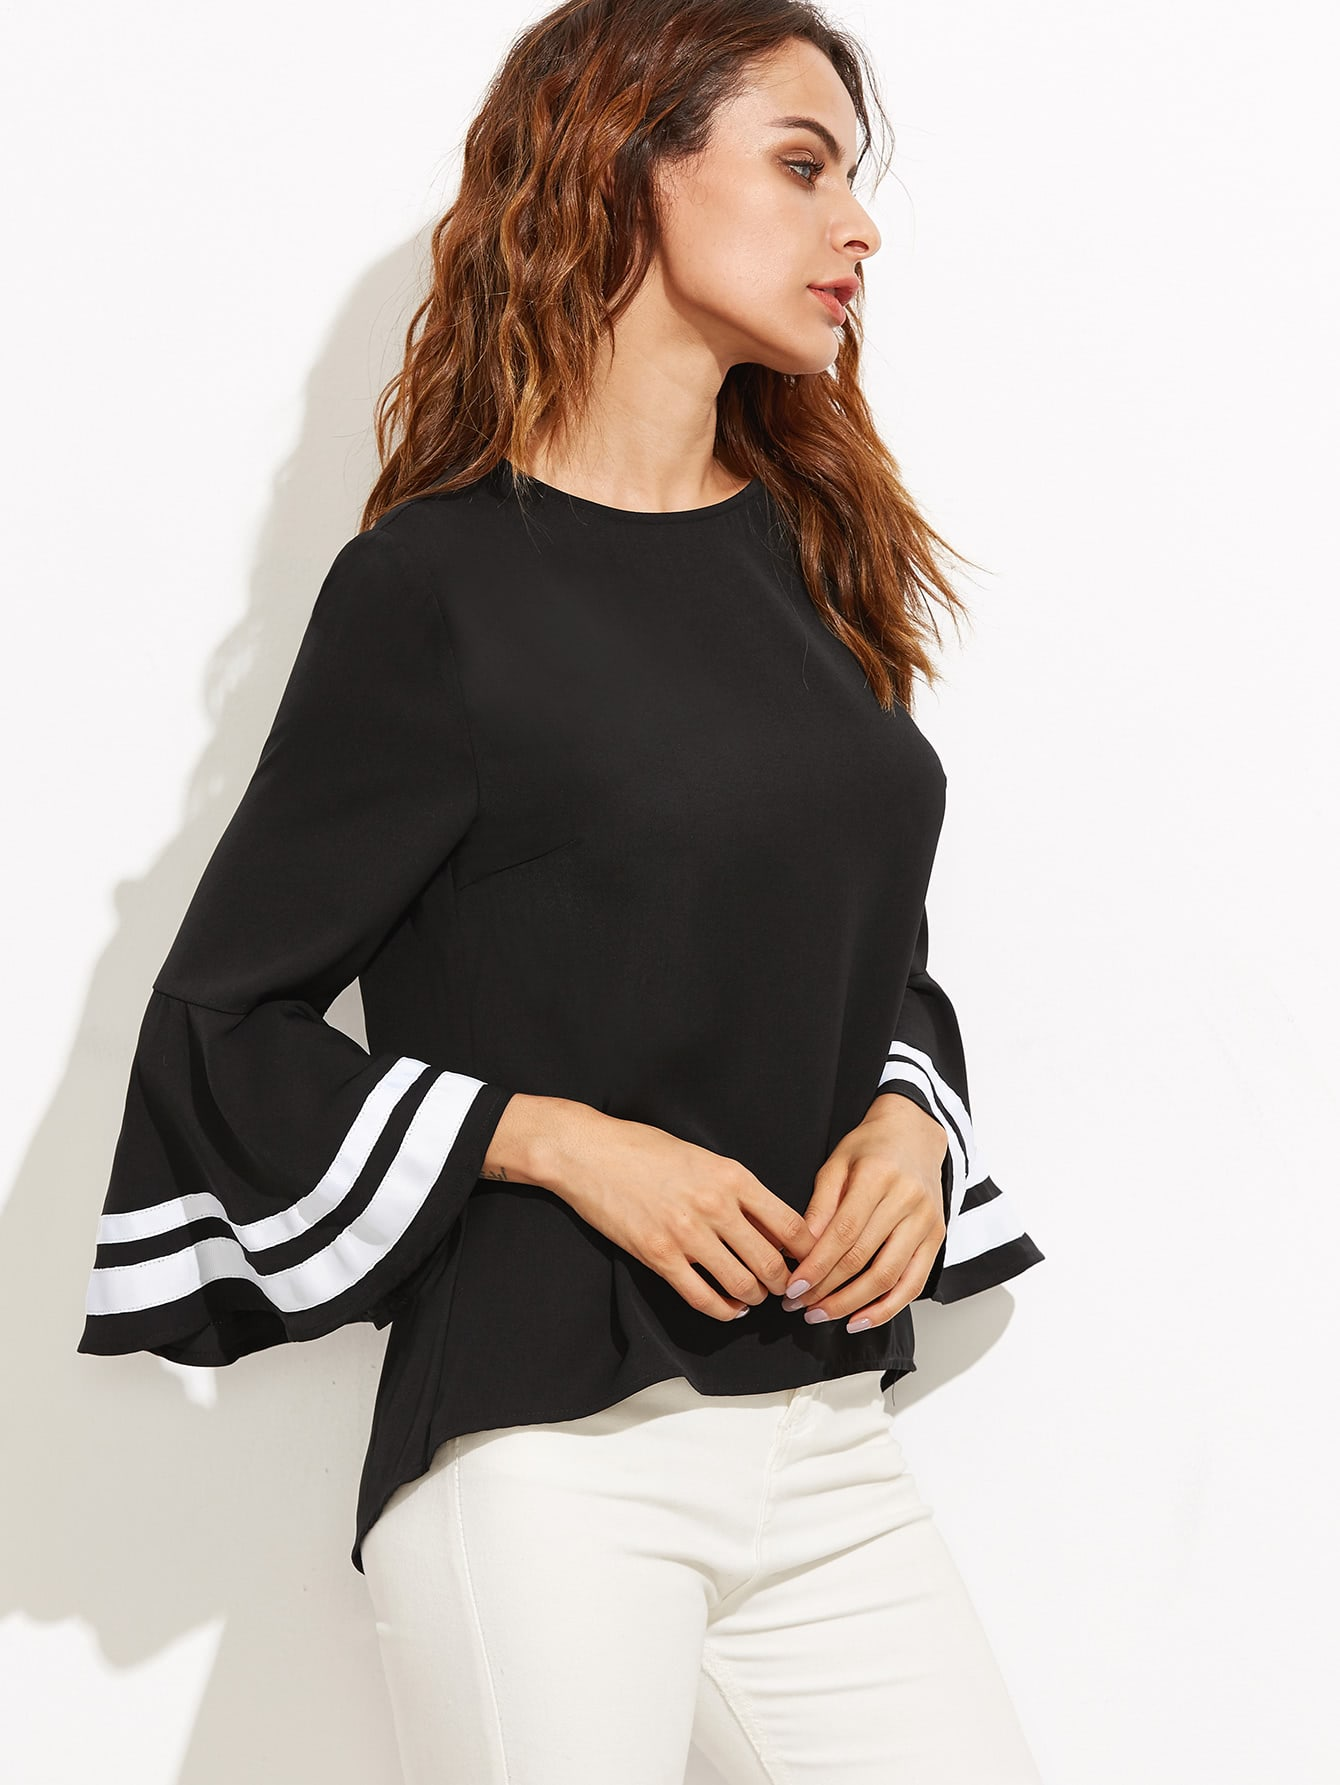 blouse160922702_2